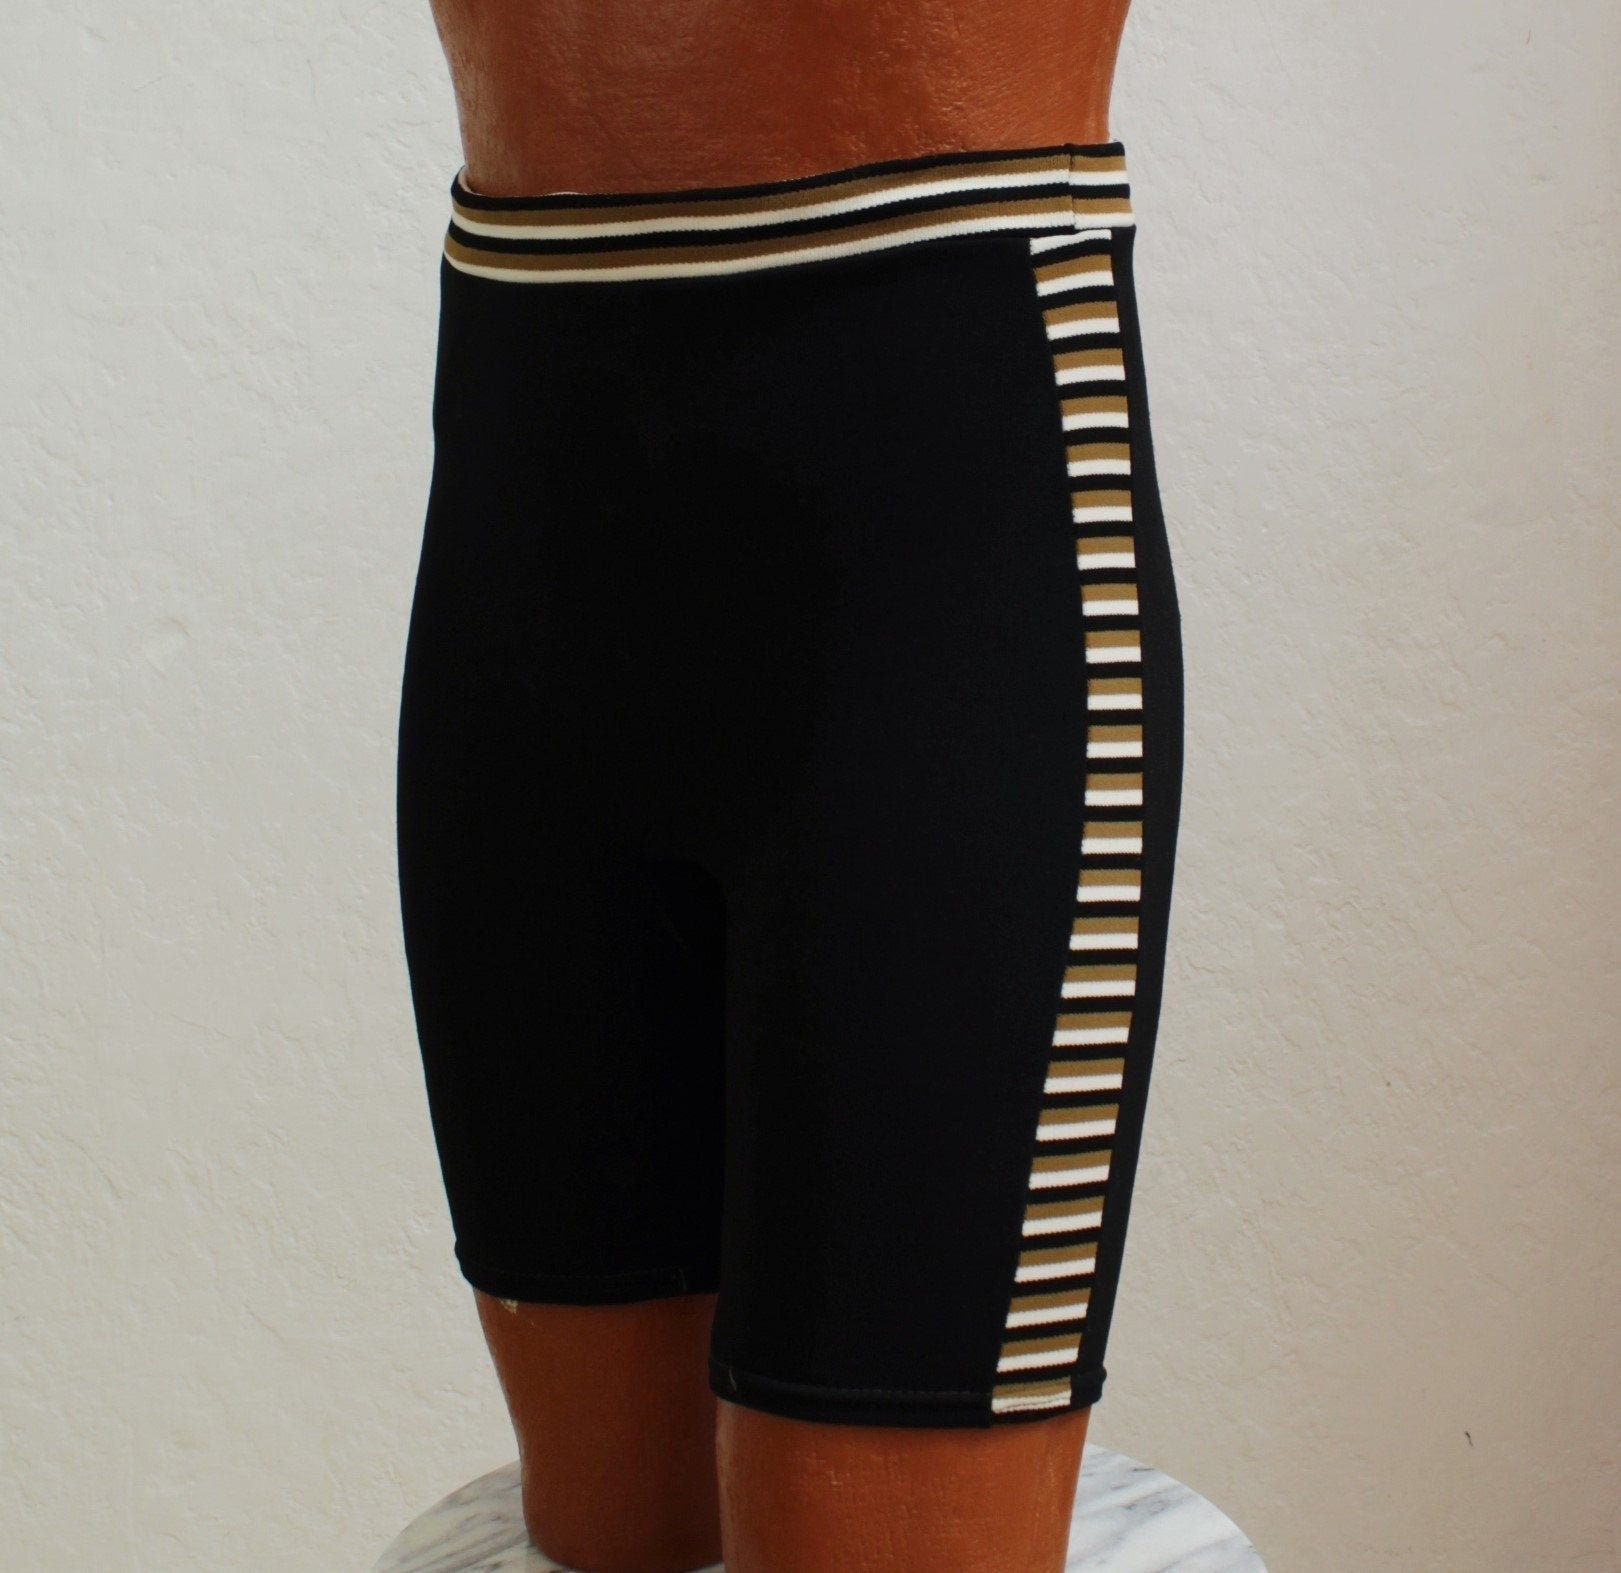 1960s – 70s Men's Ties | Skinny Ties, Slim Ties 1960s Campus Mens Swim TrunksSwimwear Size 28 - 30 Waist $65.00 AT vintagedancer.com